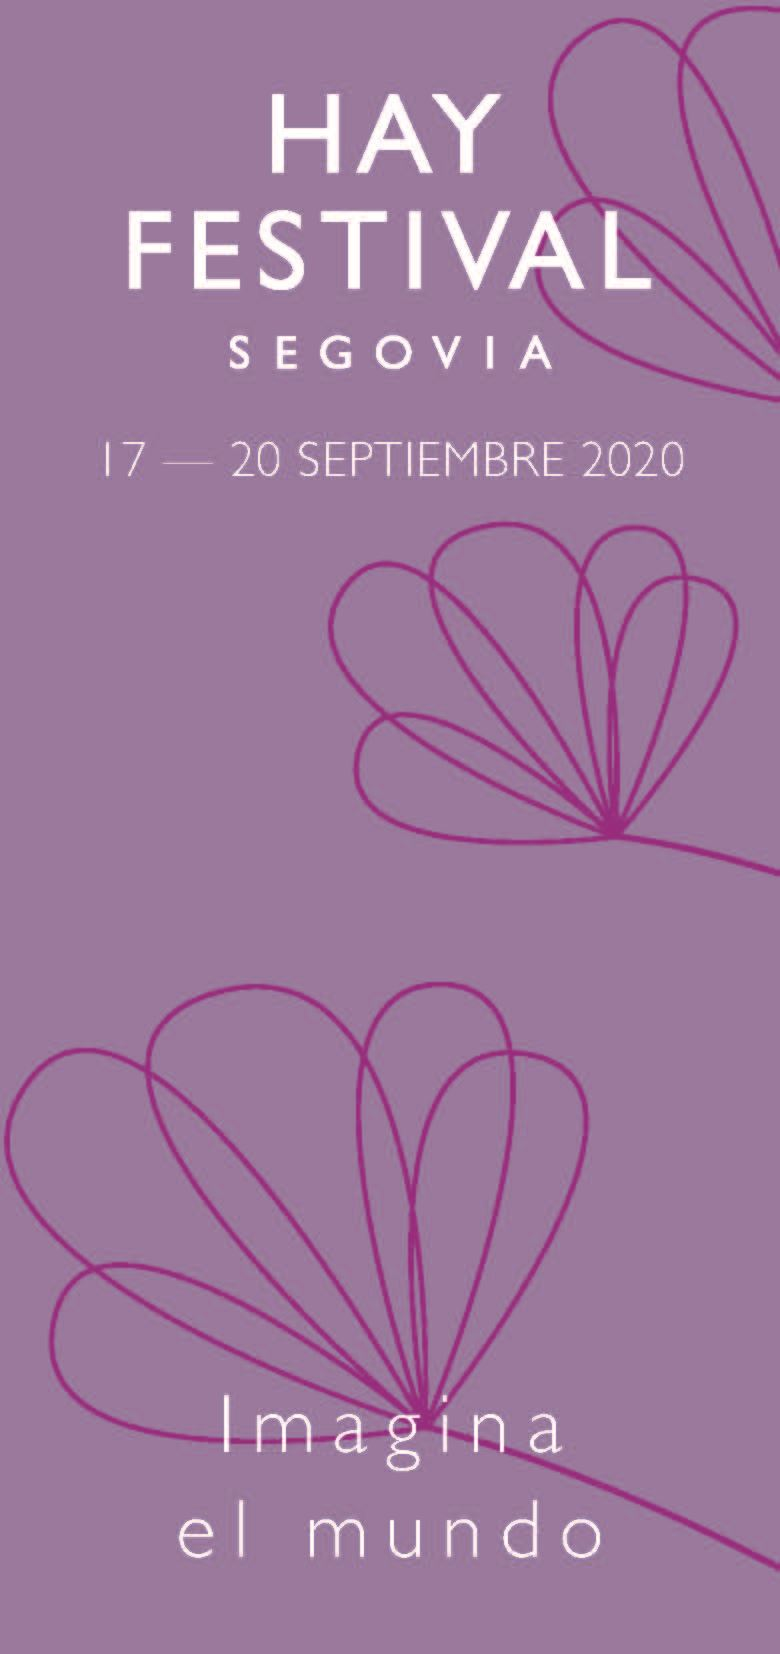 Hay Festival Segovia 2020 cartel